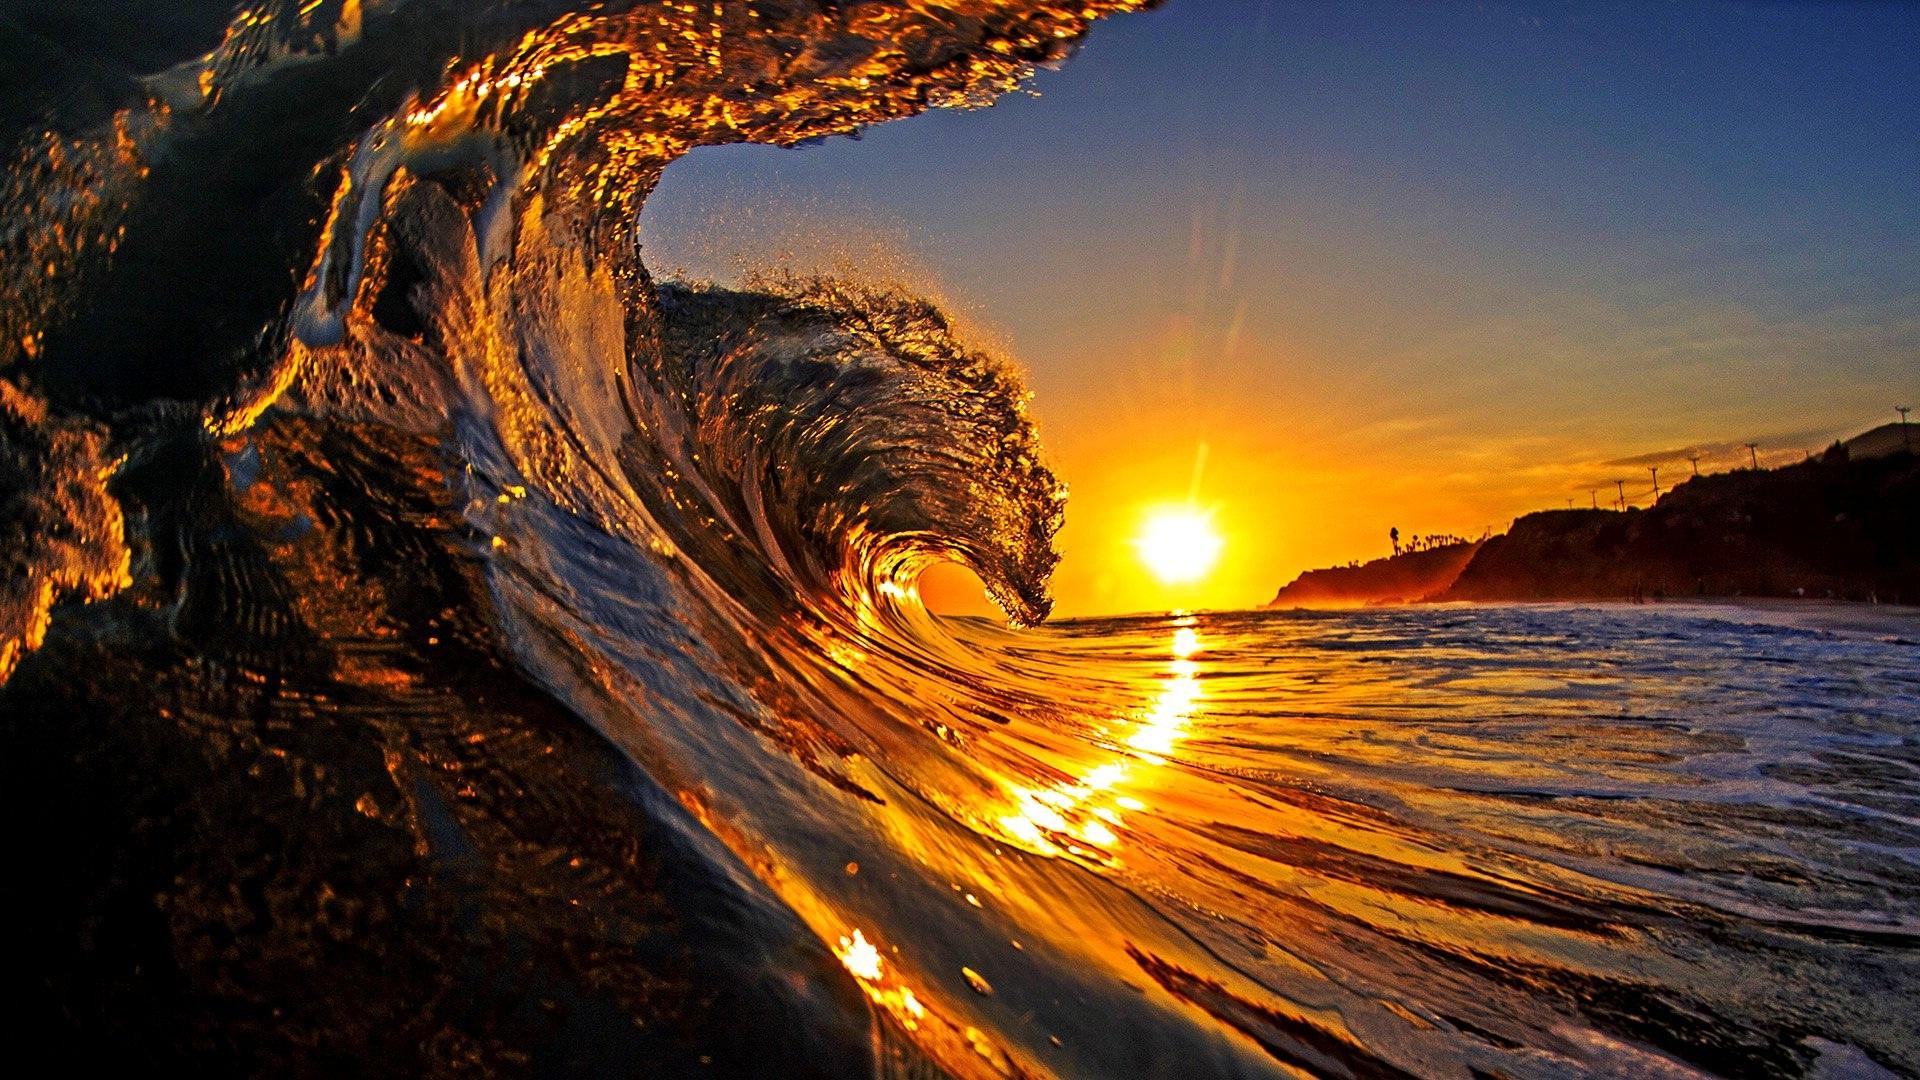 Sea sail waves and sunshine amazing wallpapers | HD Wallpapers Rocks